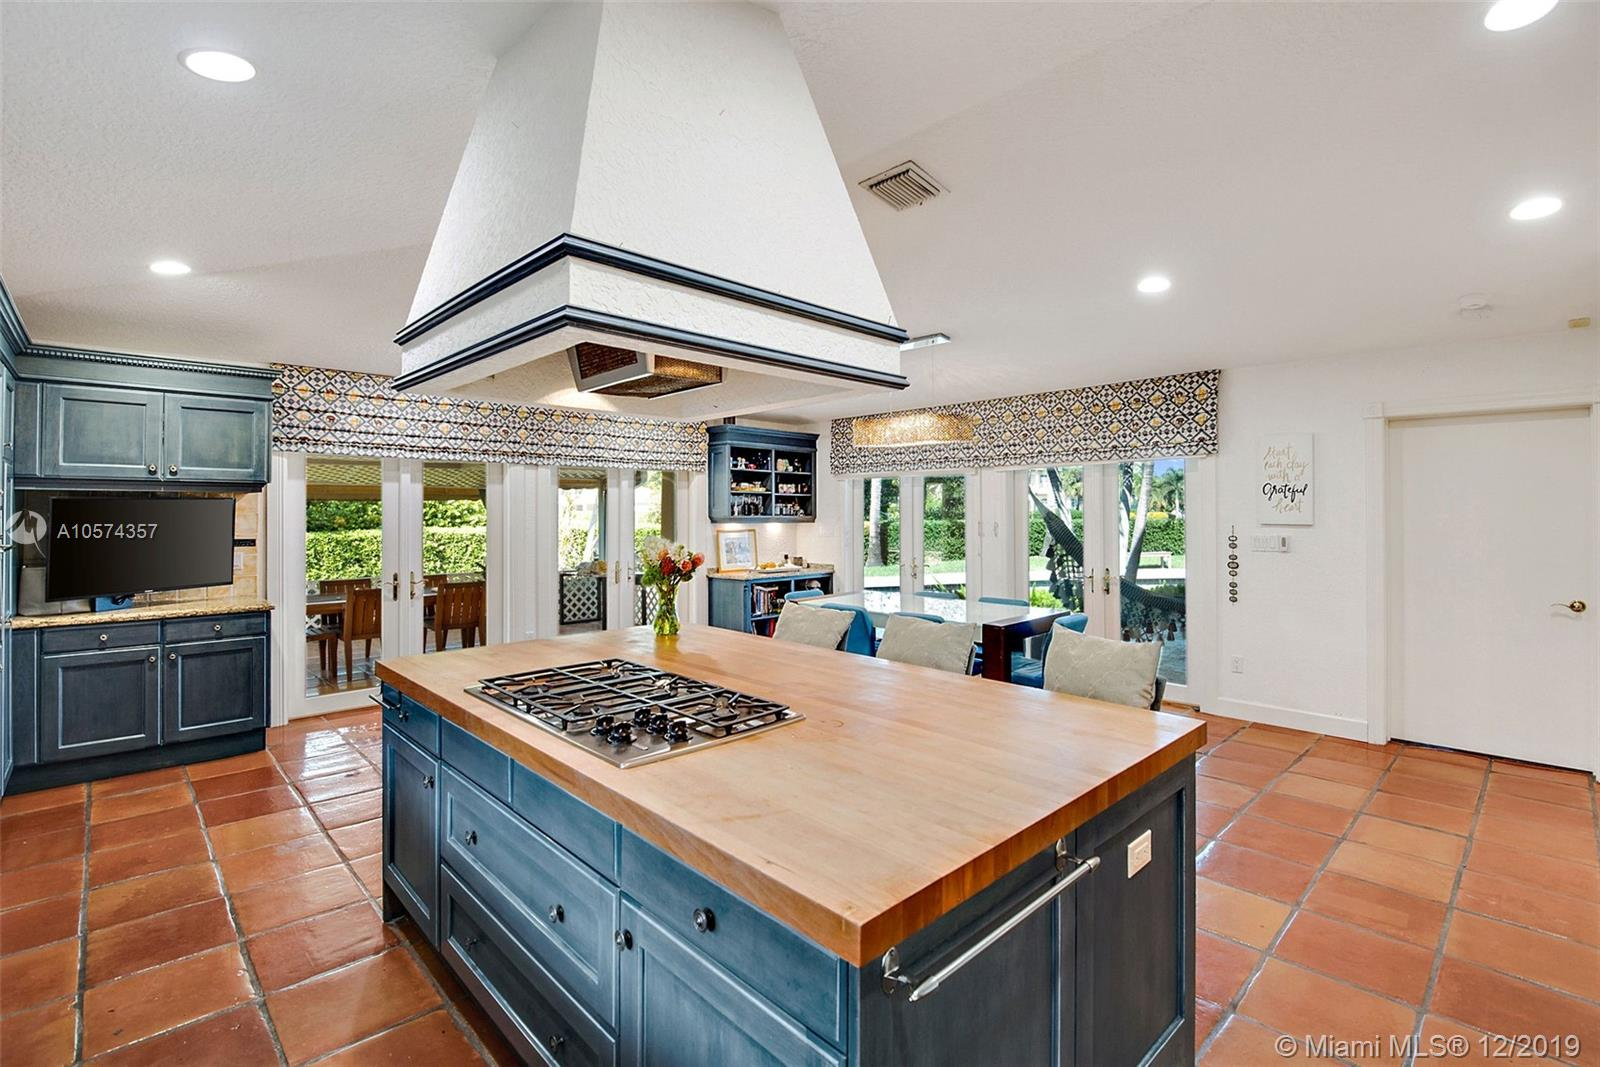 Homes for Sale in Zip Code 33432